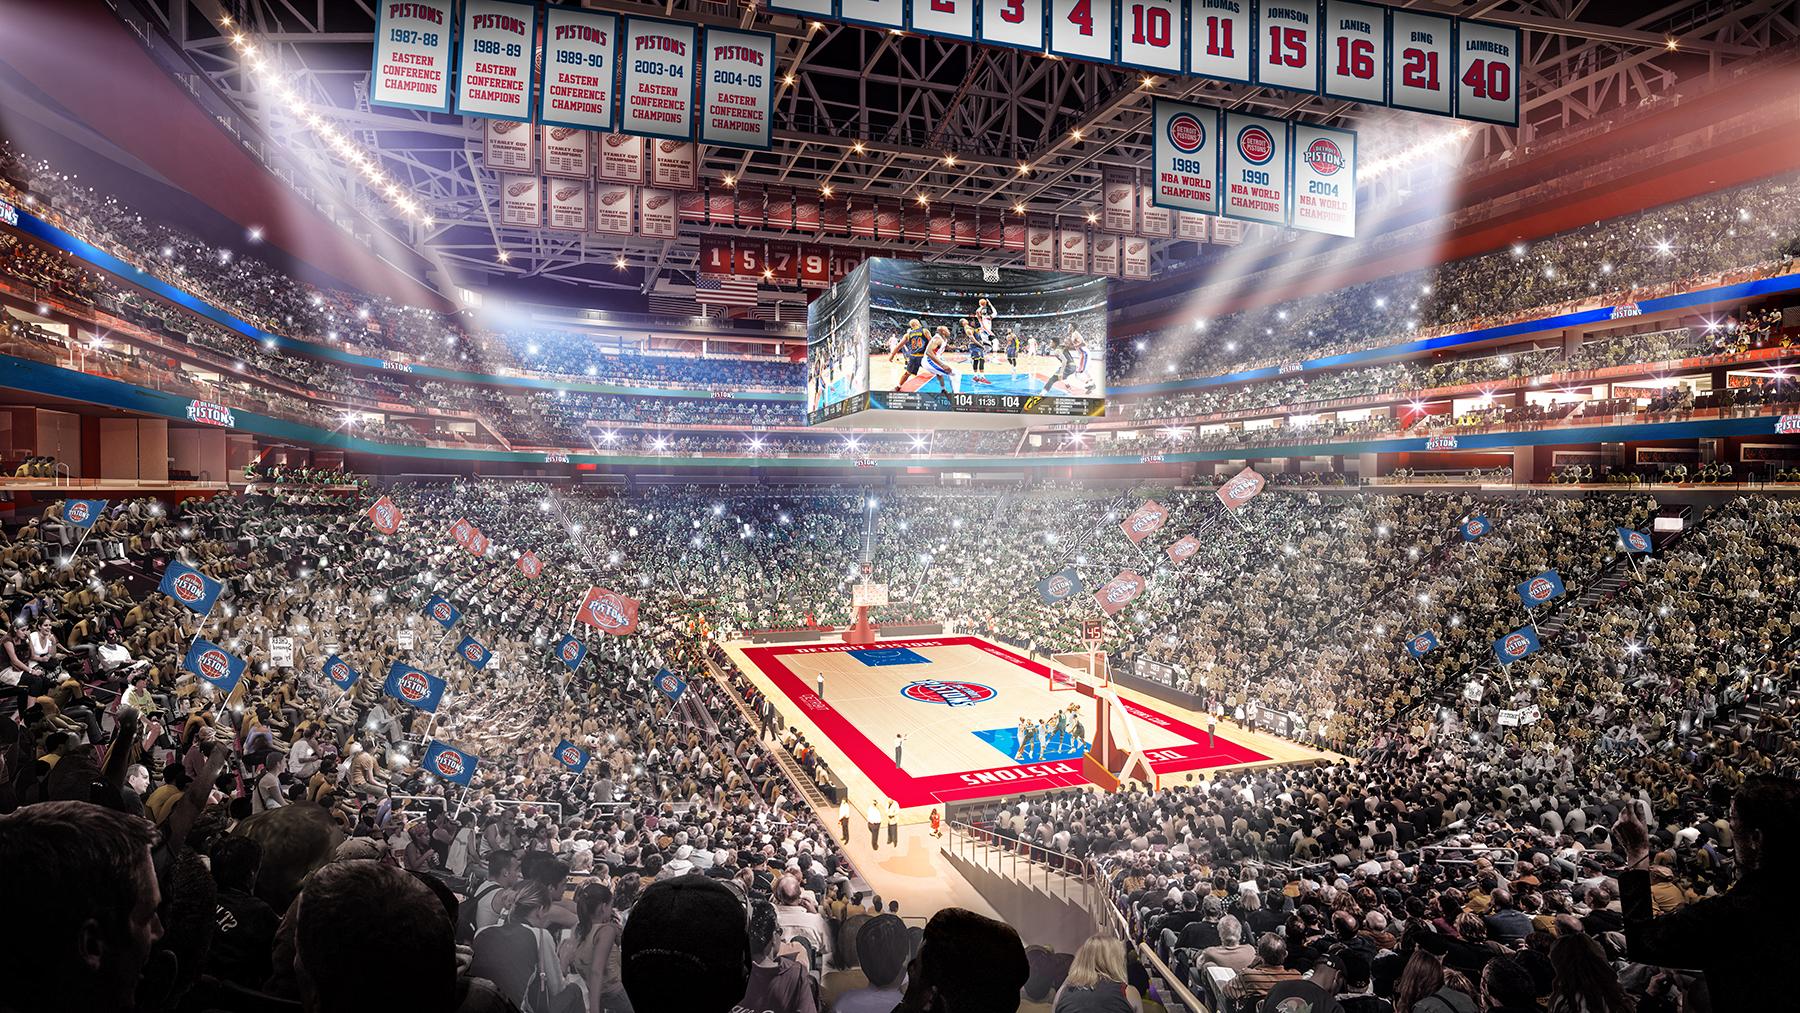 inside-arena-rendering